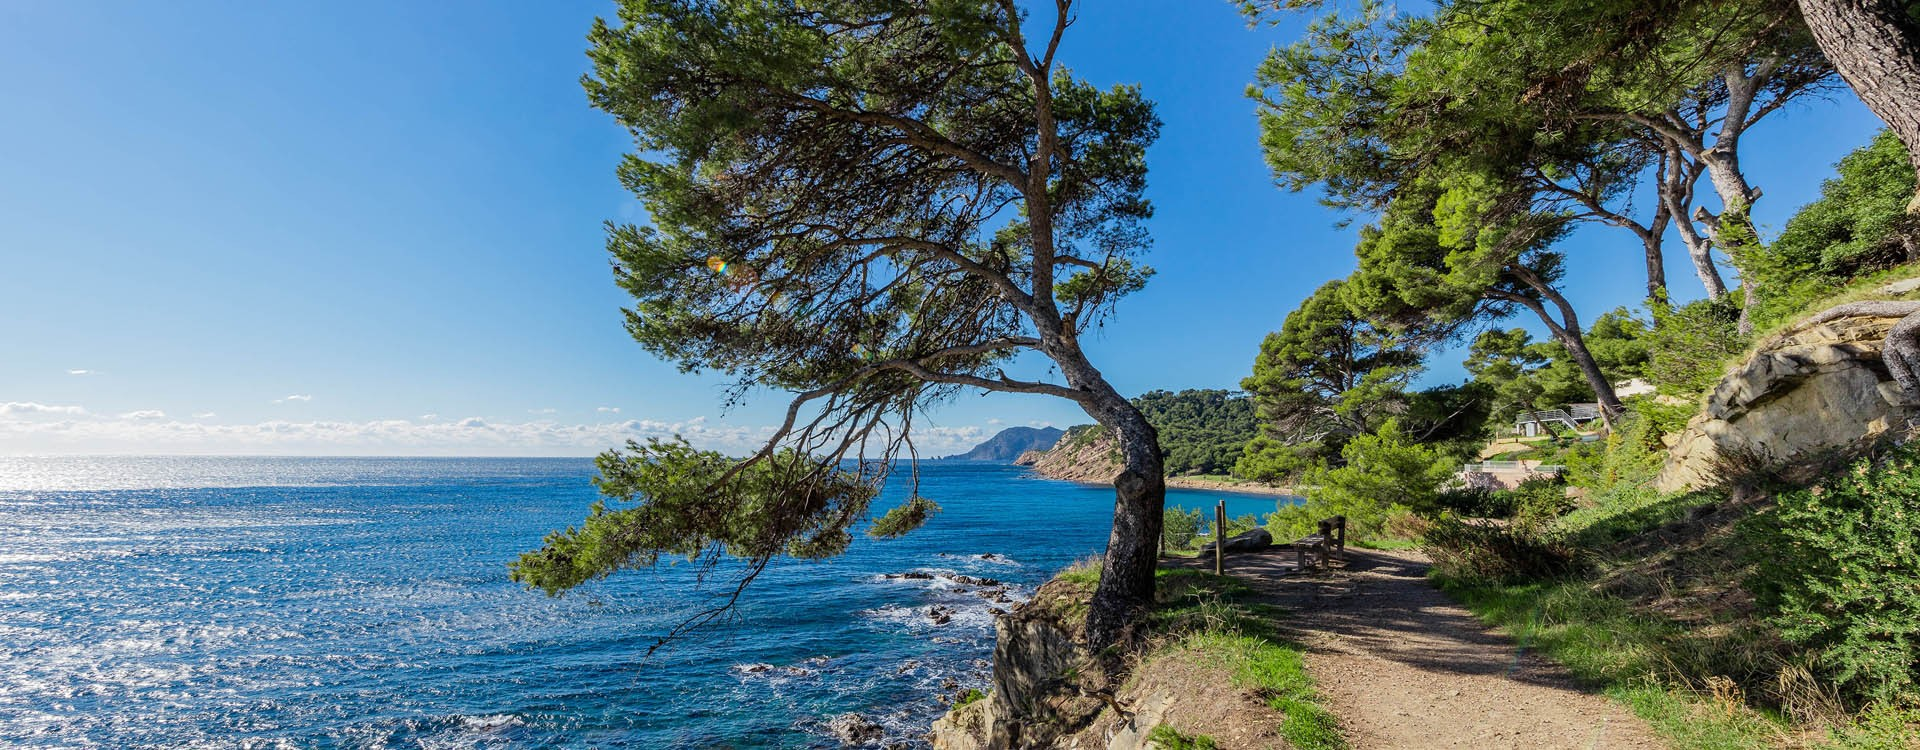 Sentier du littoral Saint Mandrier sur mer